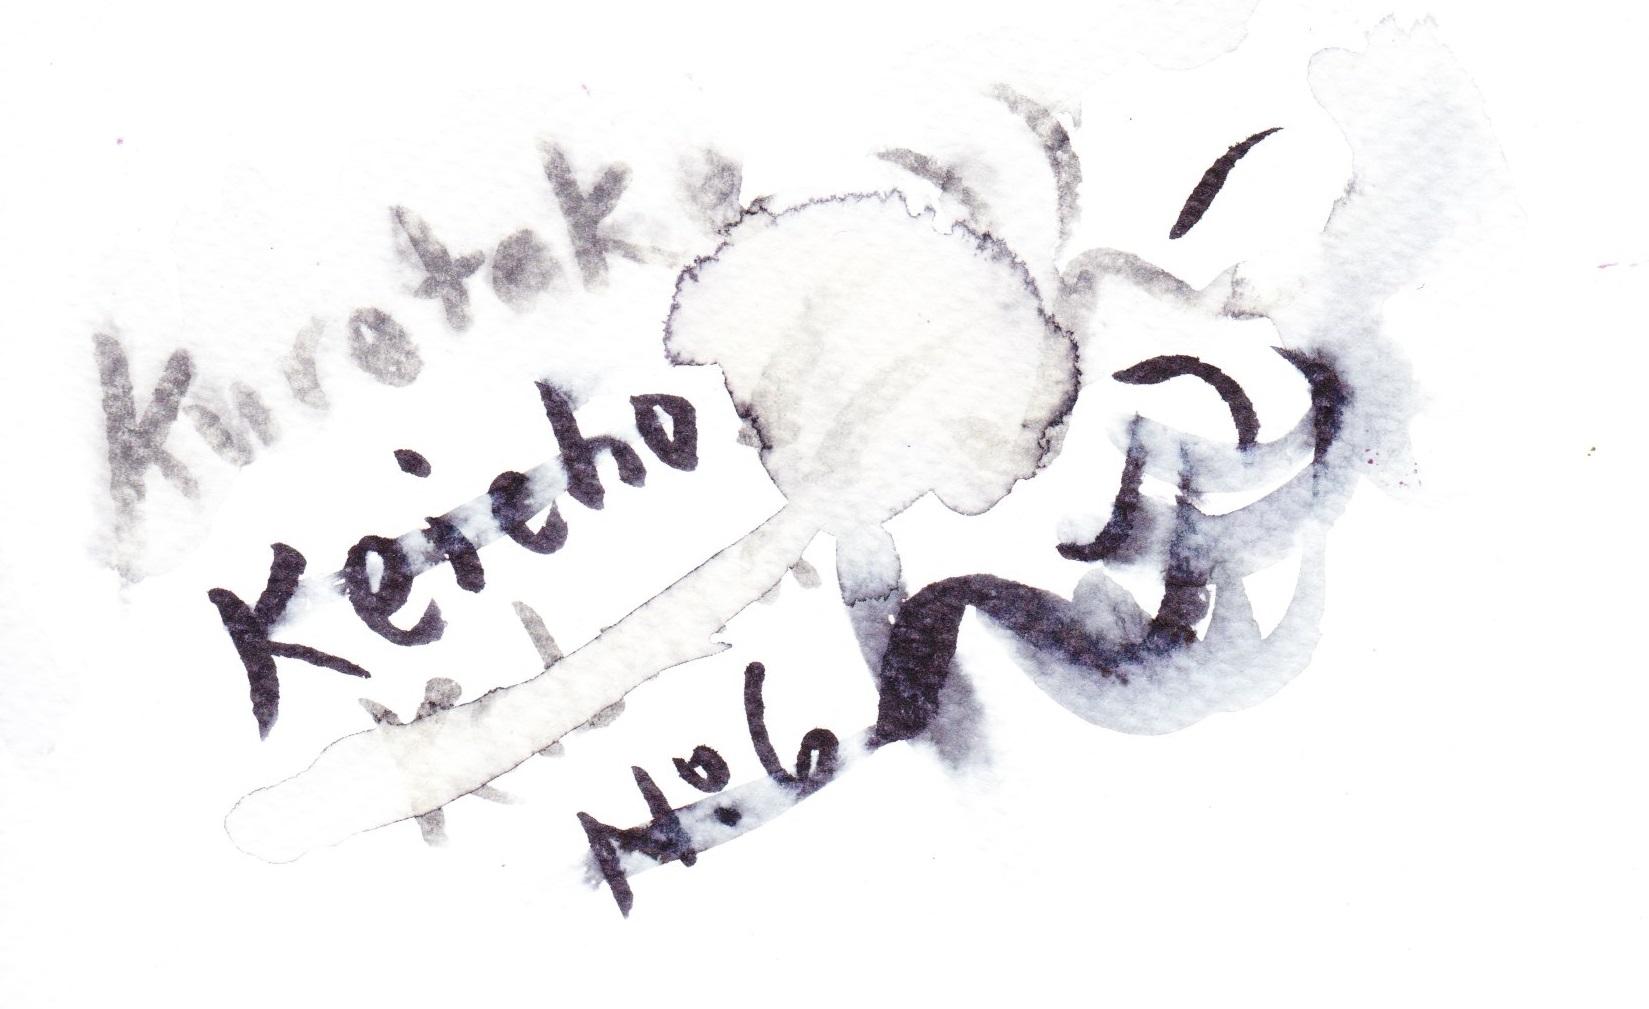 Kuretake Keicho Kabura 'No.6' Fude Pen dilute on cold pressed paper